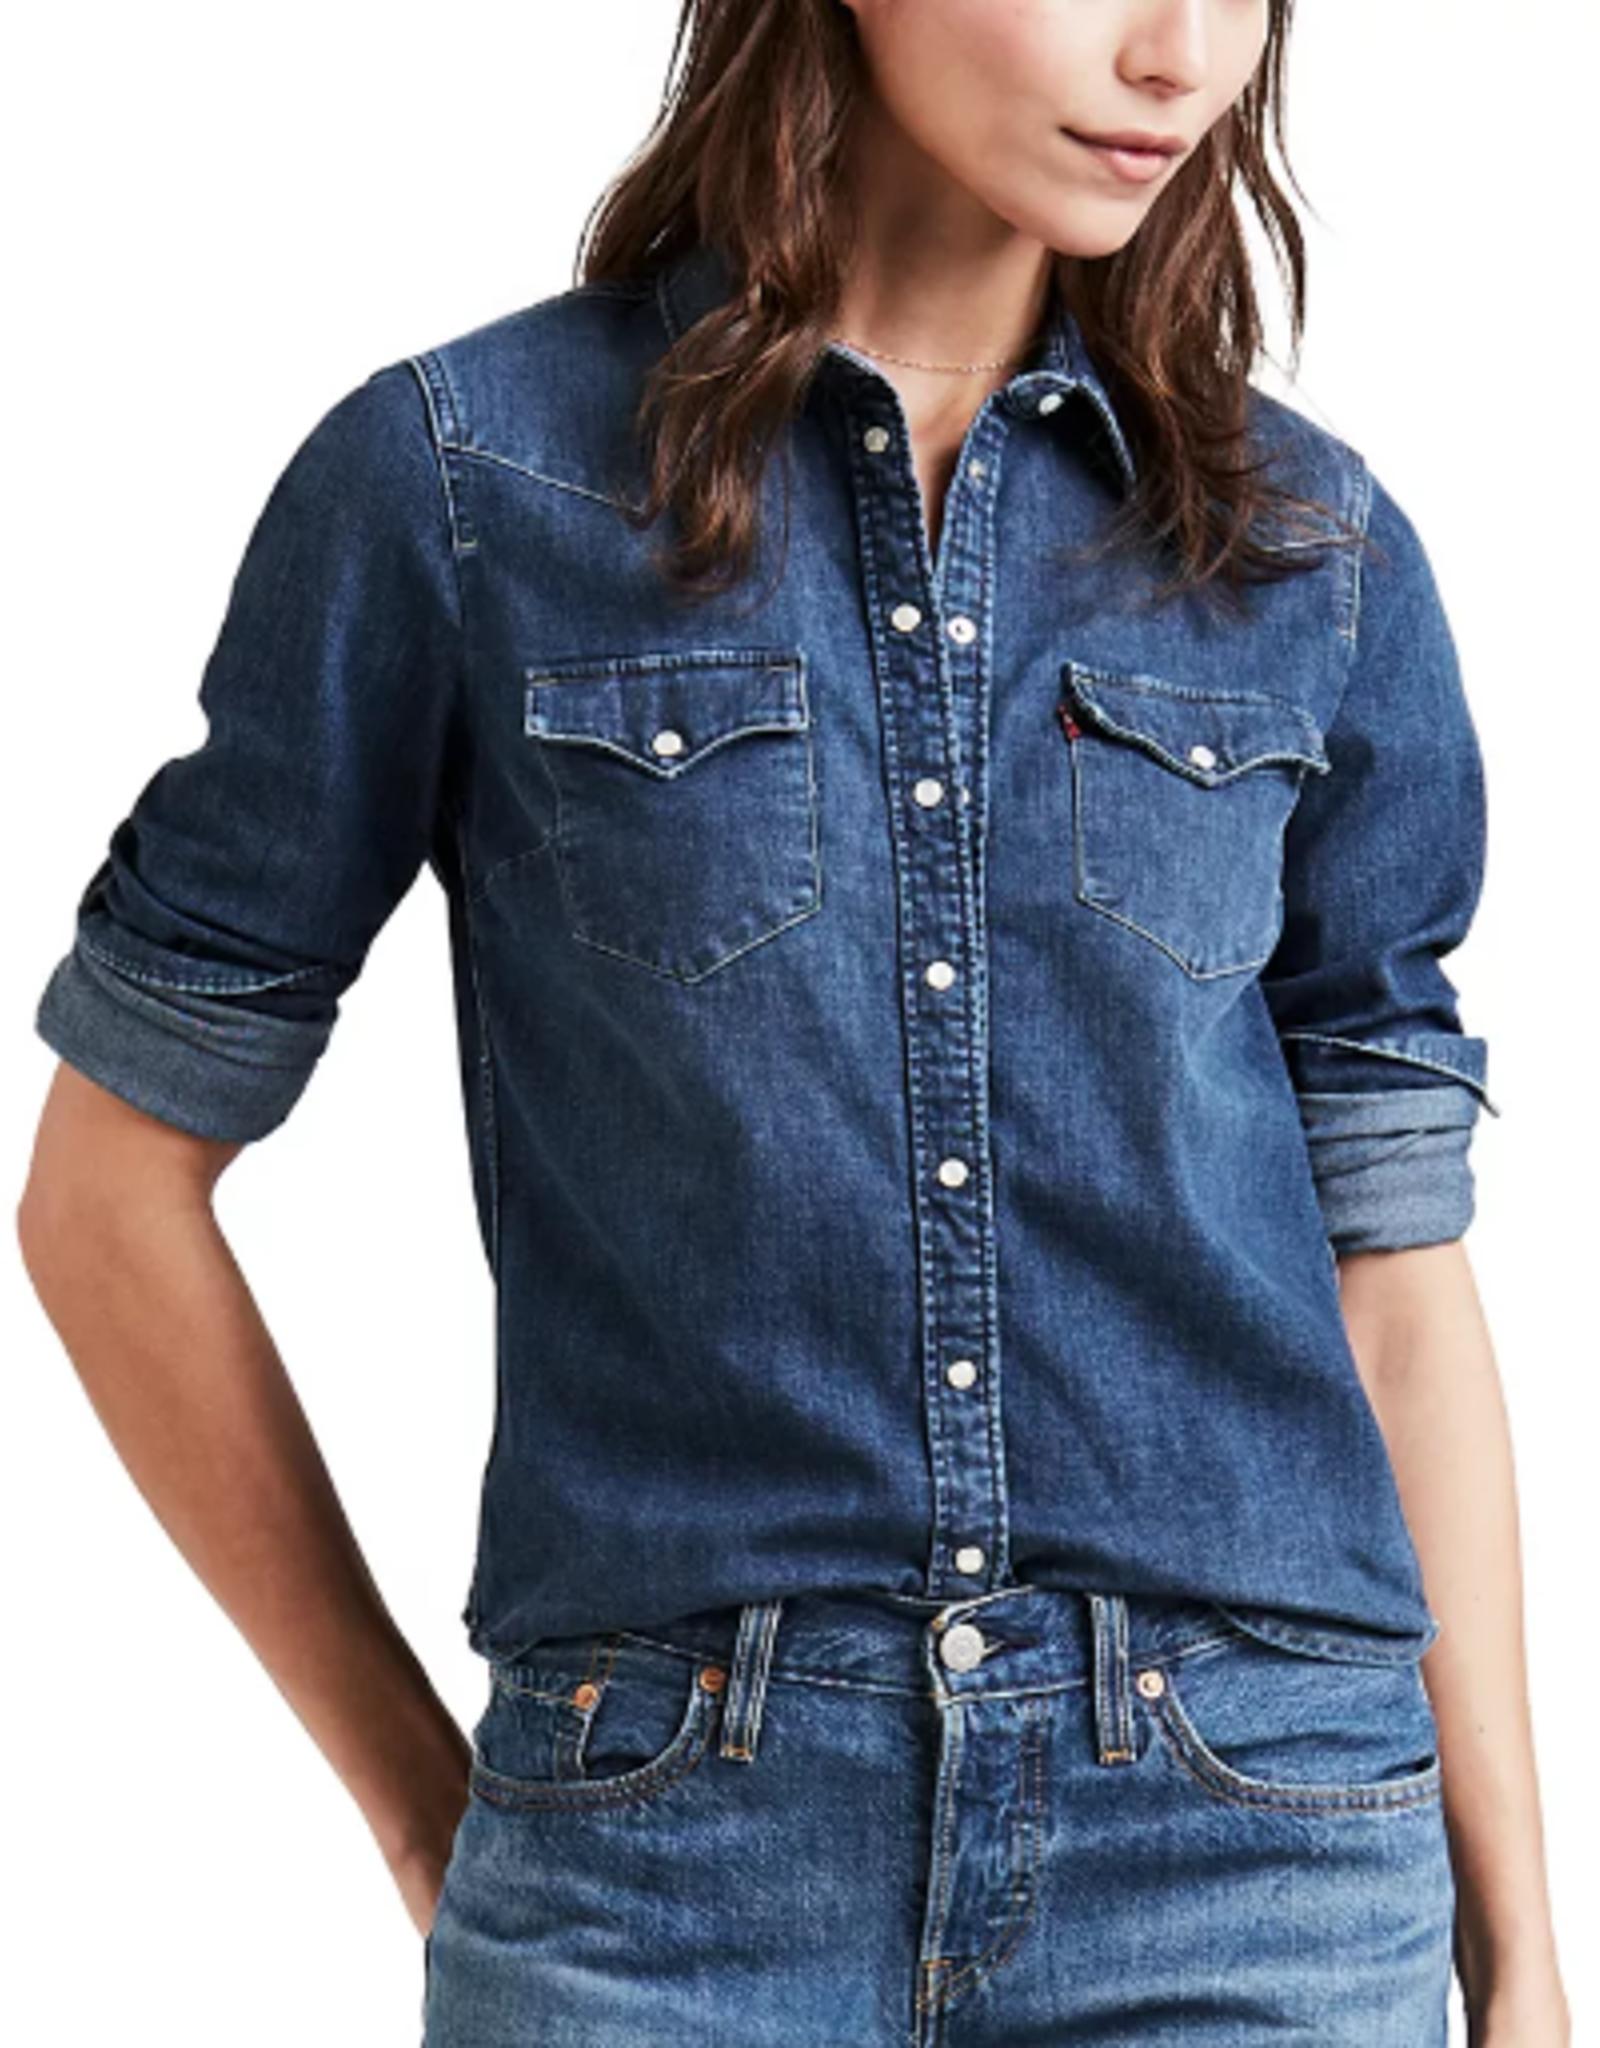 Levi's Ultimate Denim Button Down Shirt in Lotta Love